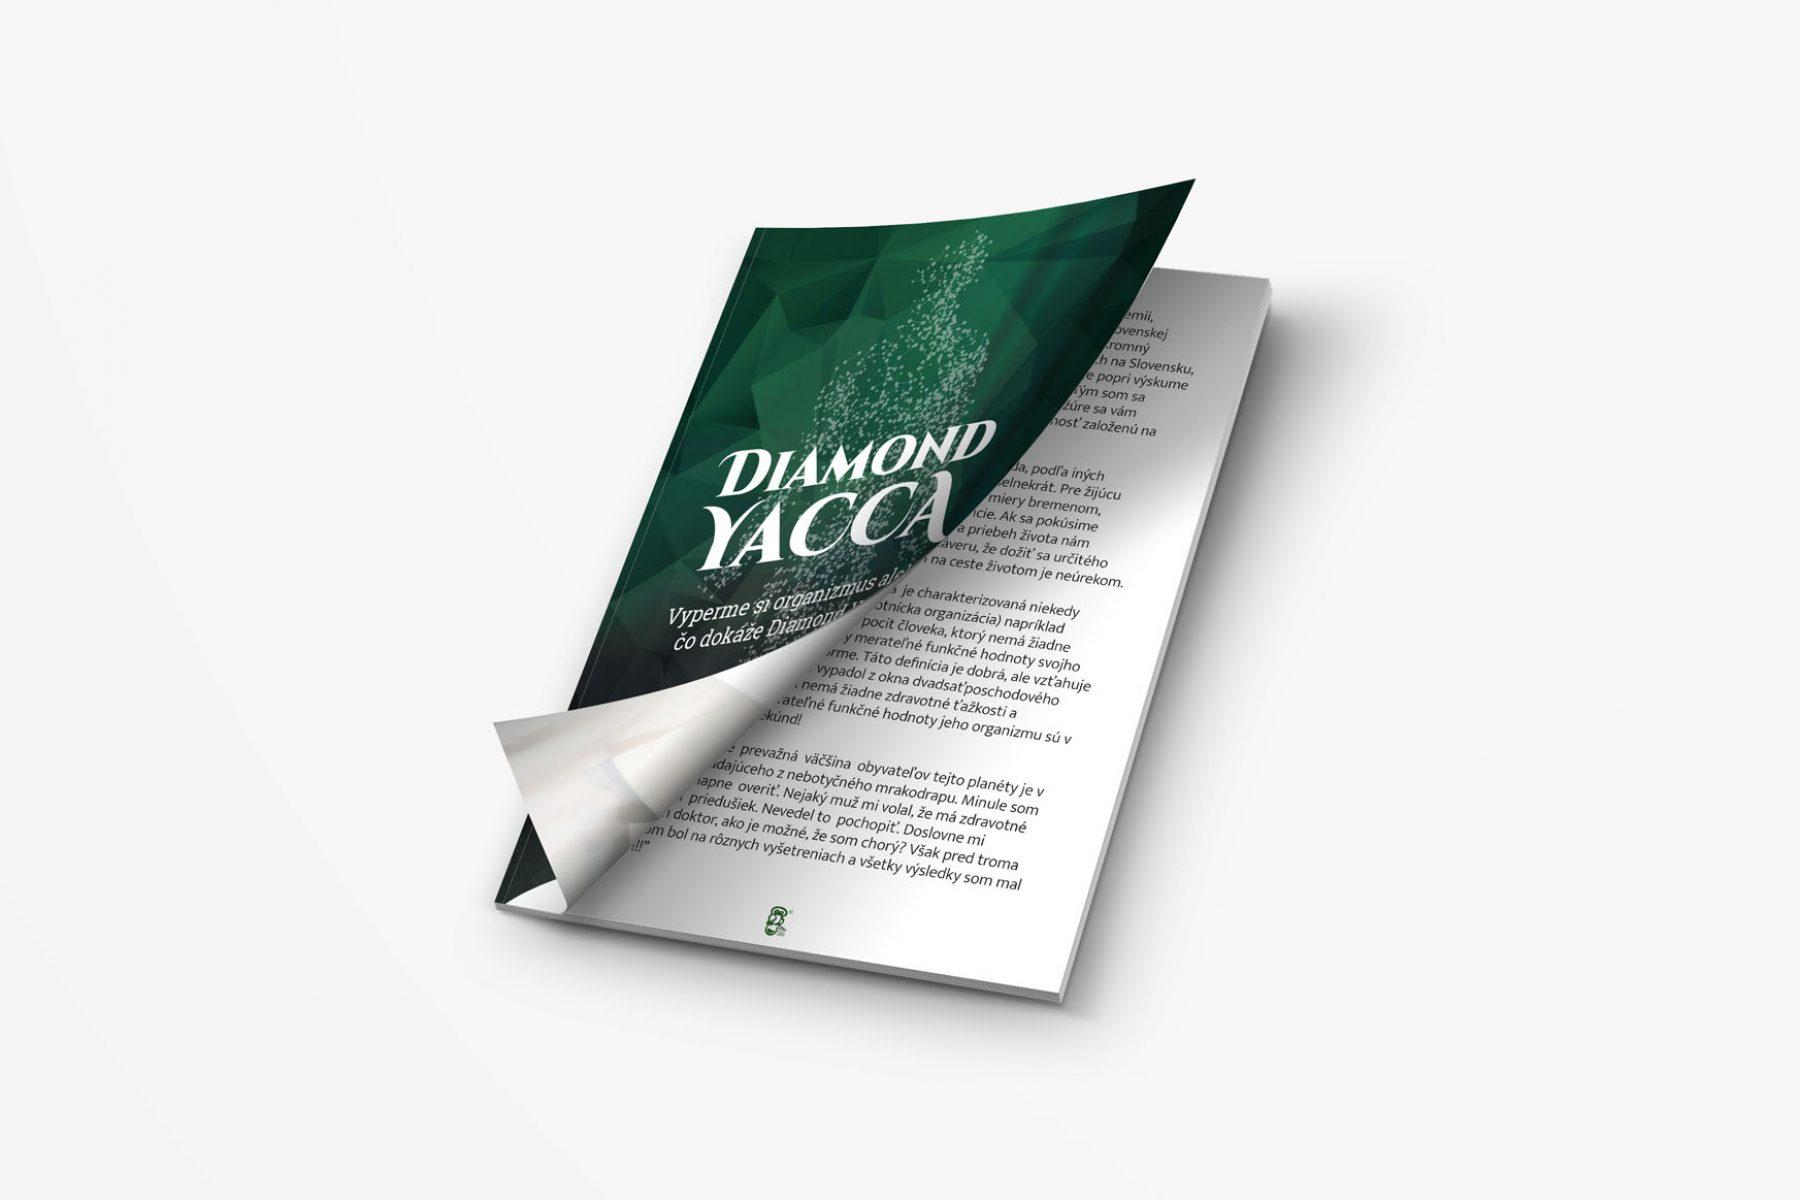 diamond-yacca-katalóg-1